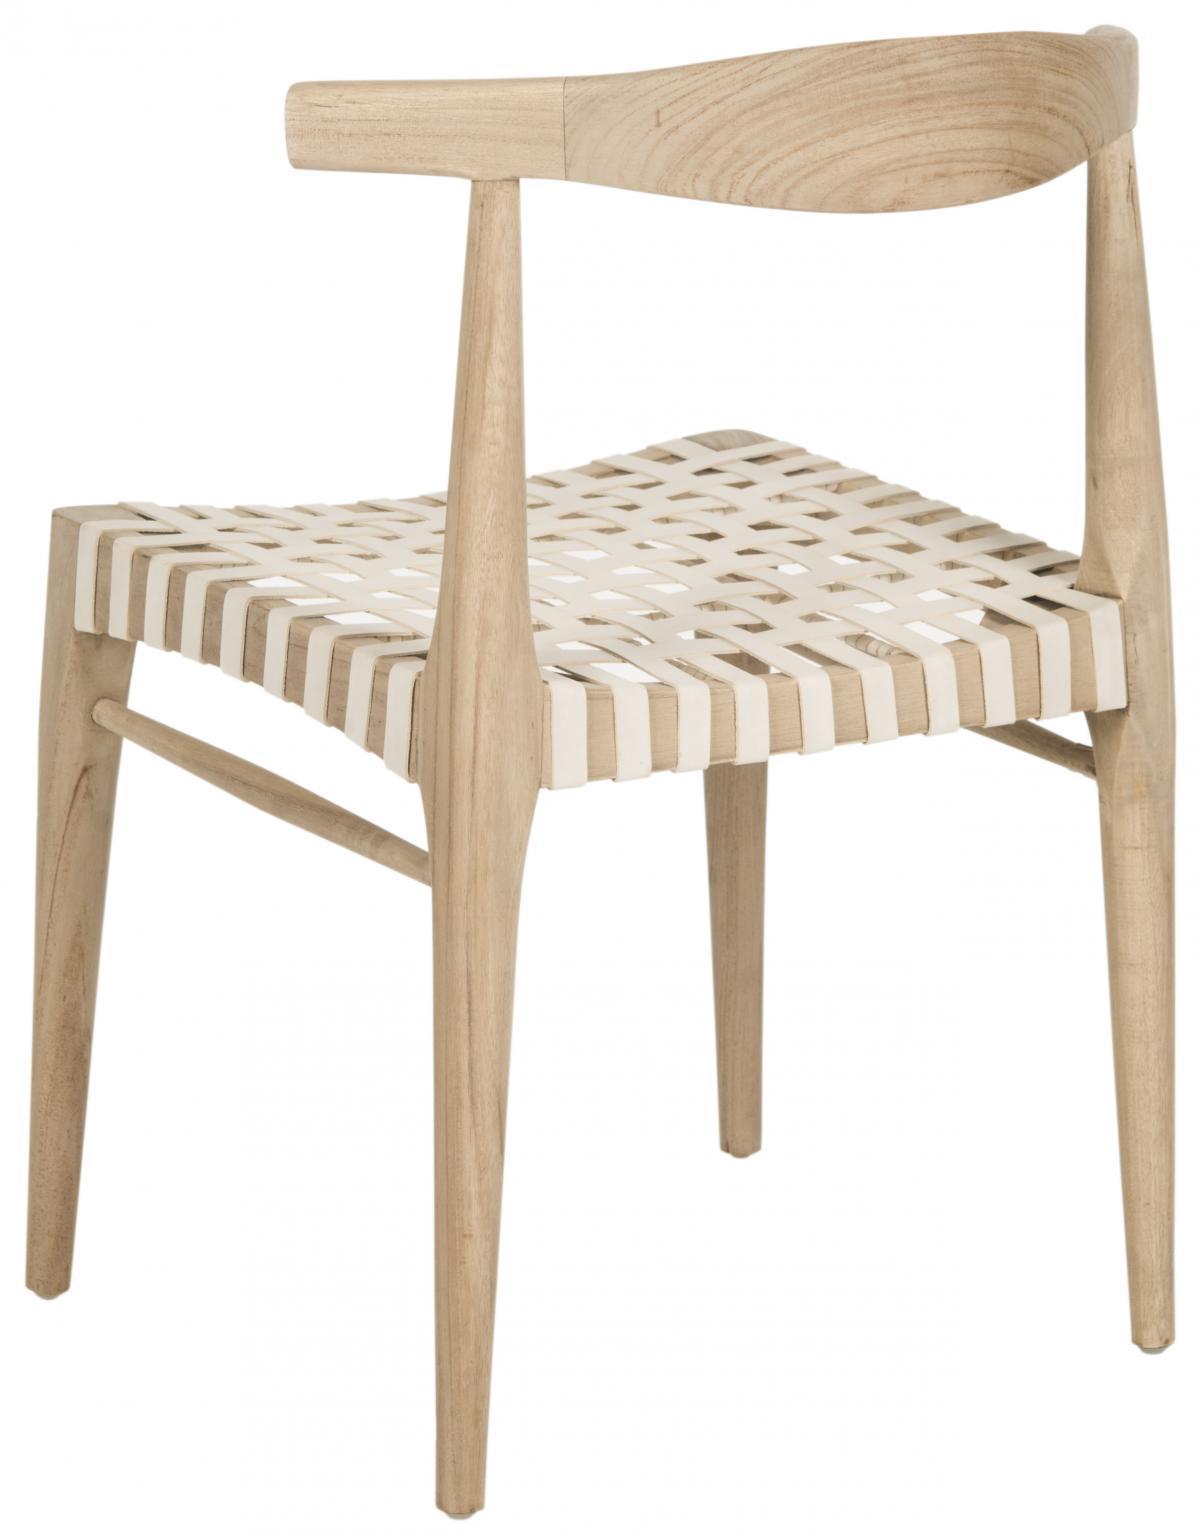 FOX1018A-SET2 Dining Chairs - Furniture by Safavieh  Safavieh